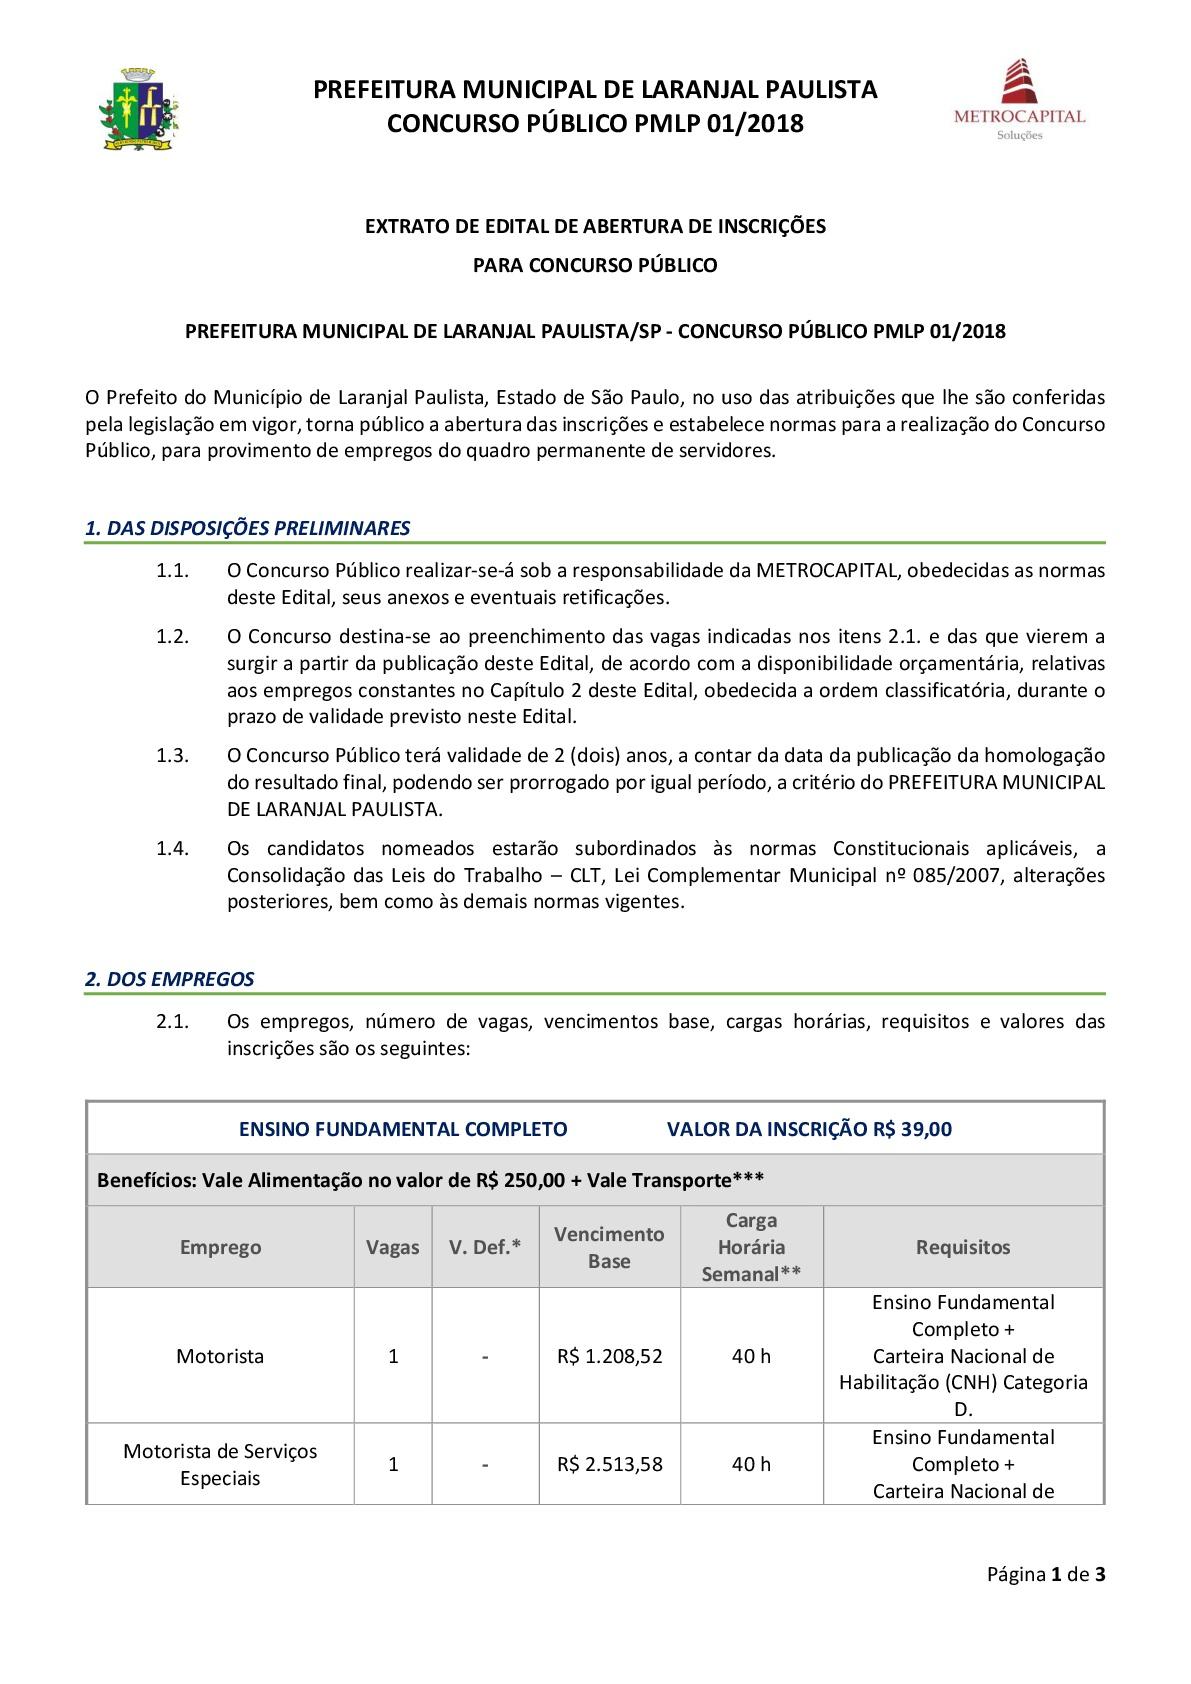 Concurso Público PMLP 01/2018 - Prefeitura Municipal de Laranjal Paulista